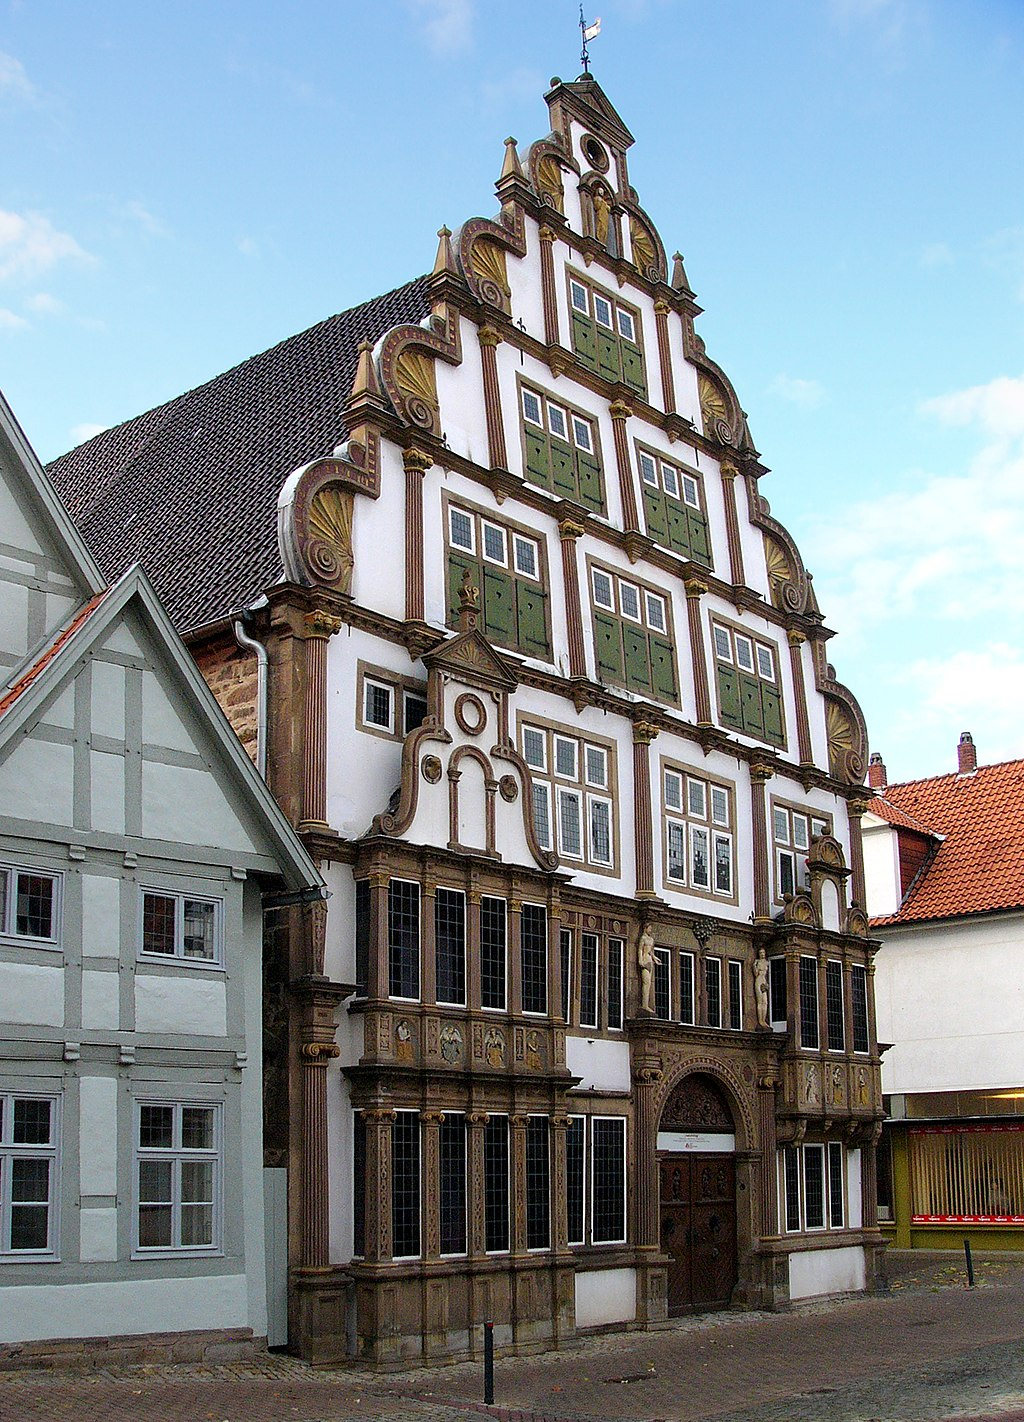 Lemgo Germany  city pictures gallery : Hexenbürgermeisterhaus in Lemgo, Germany